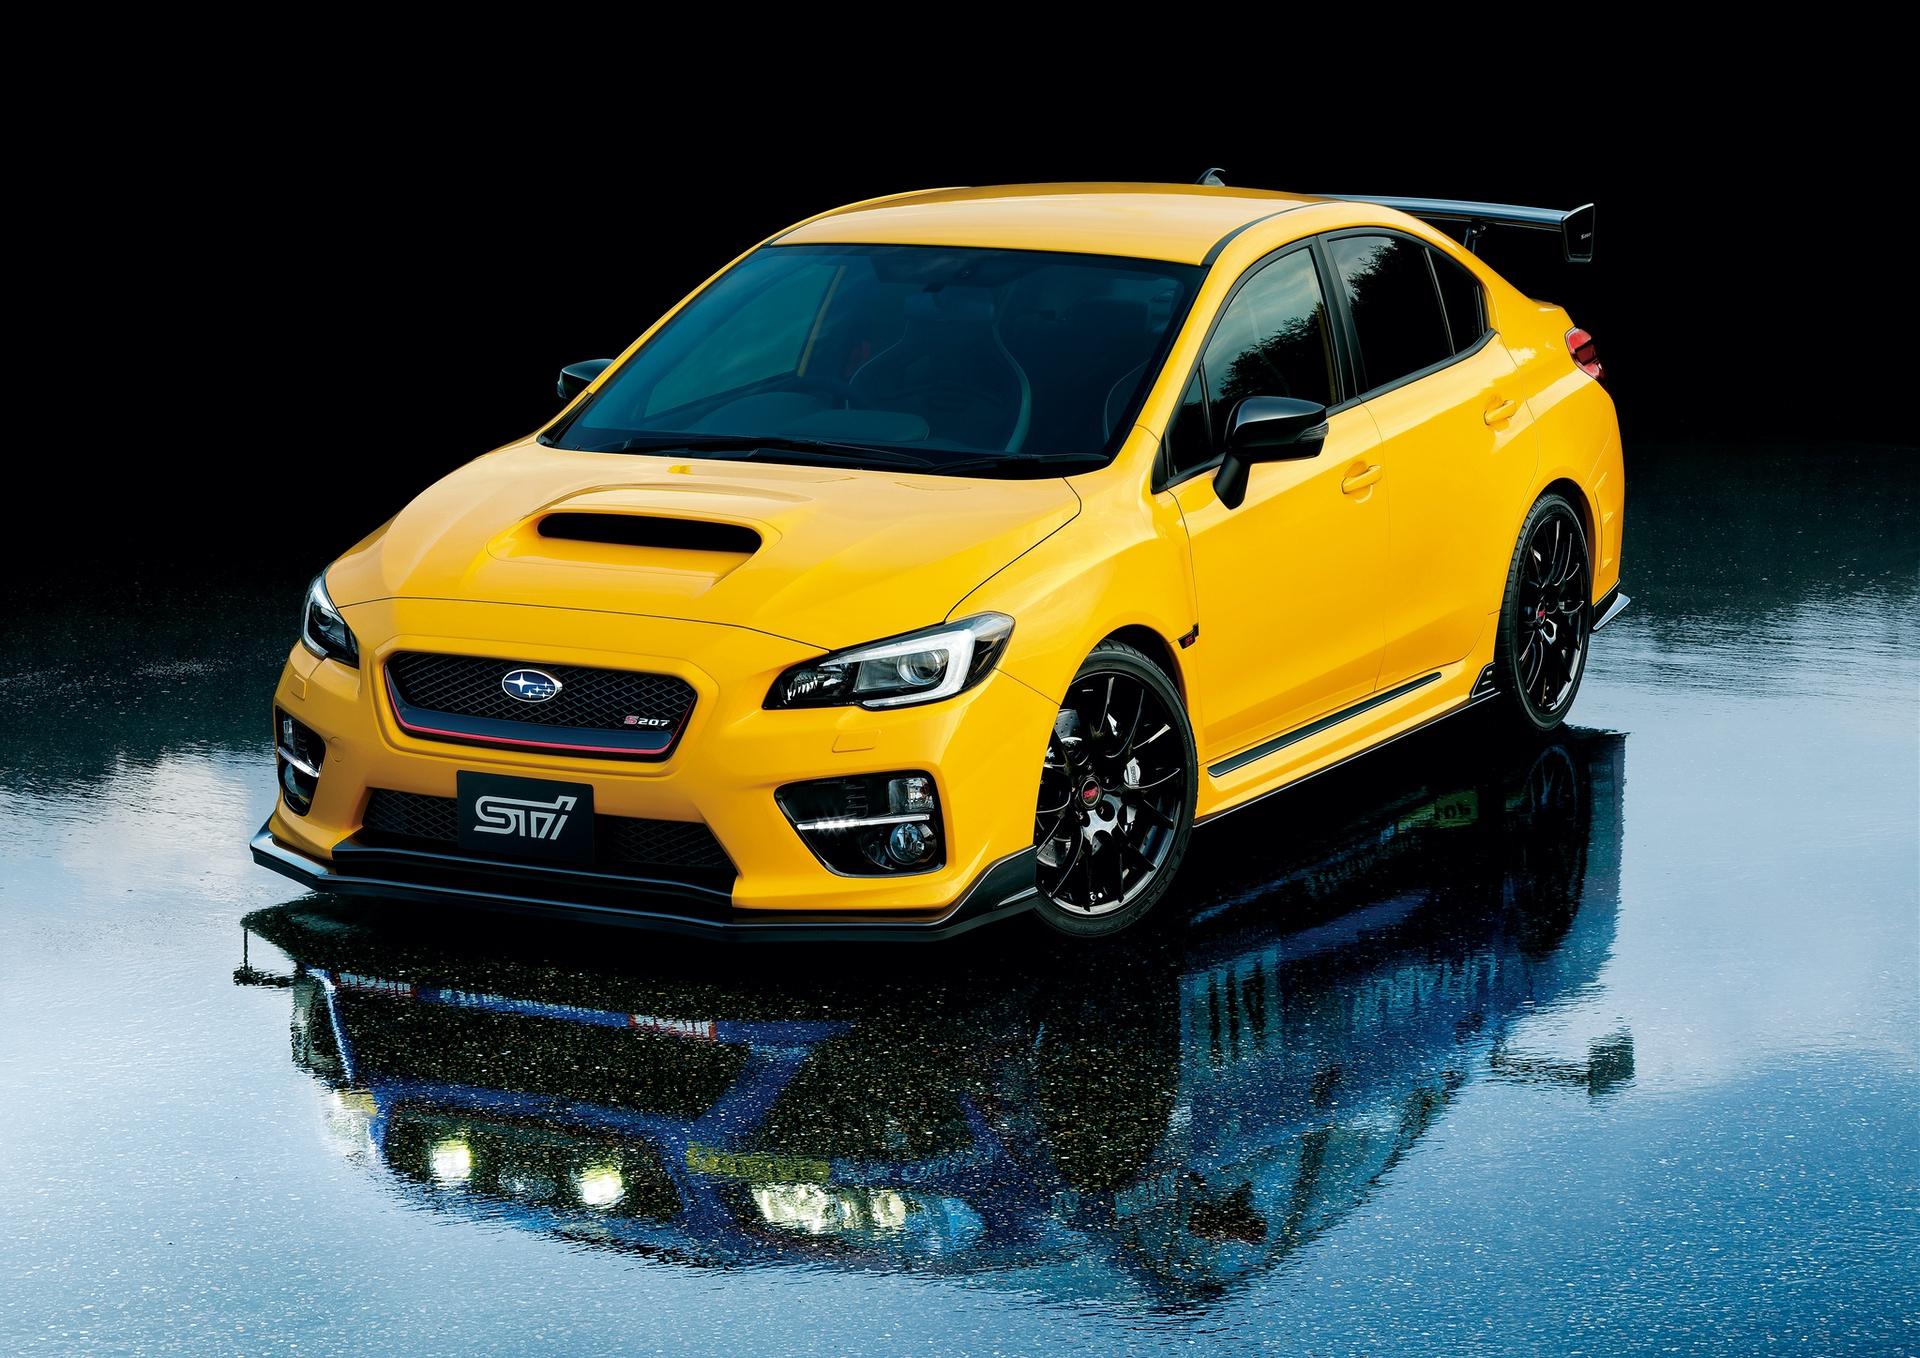 Subaru_Impreza_STI_S207_NBR_Challenge_Package_0002